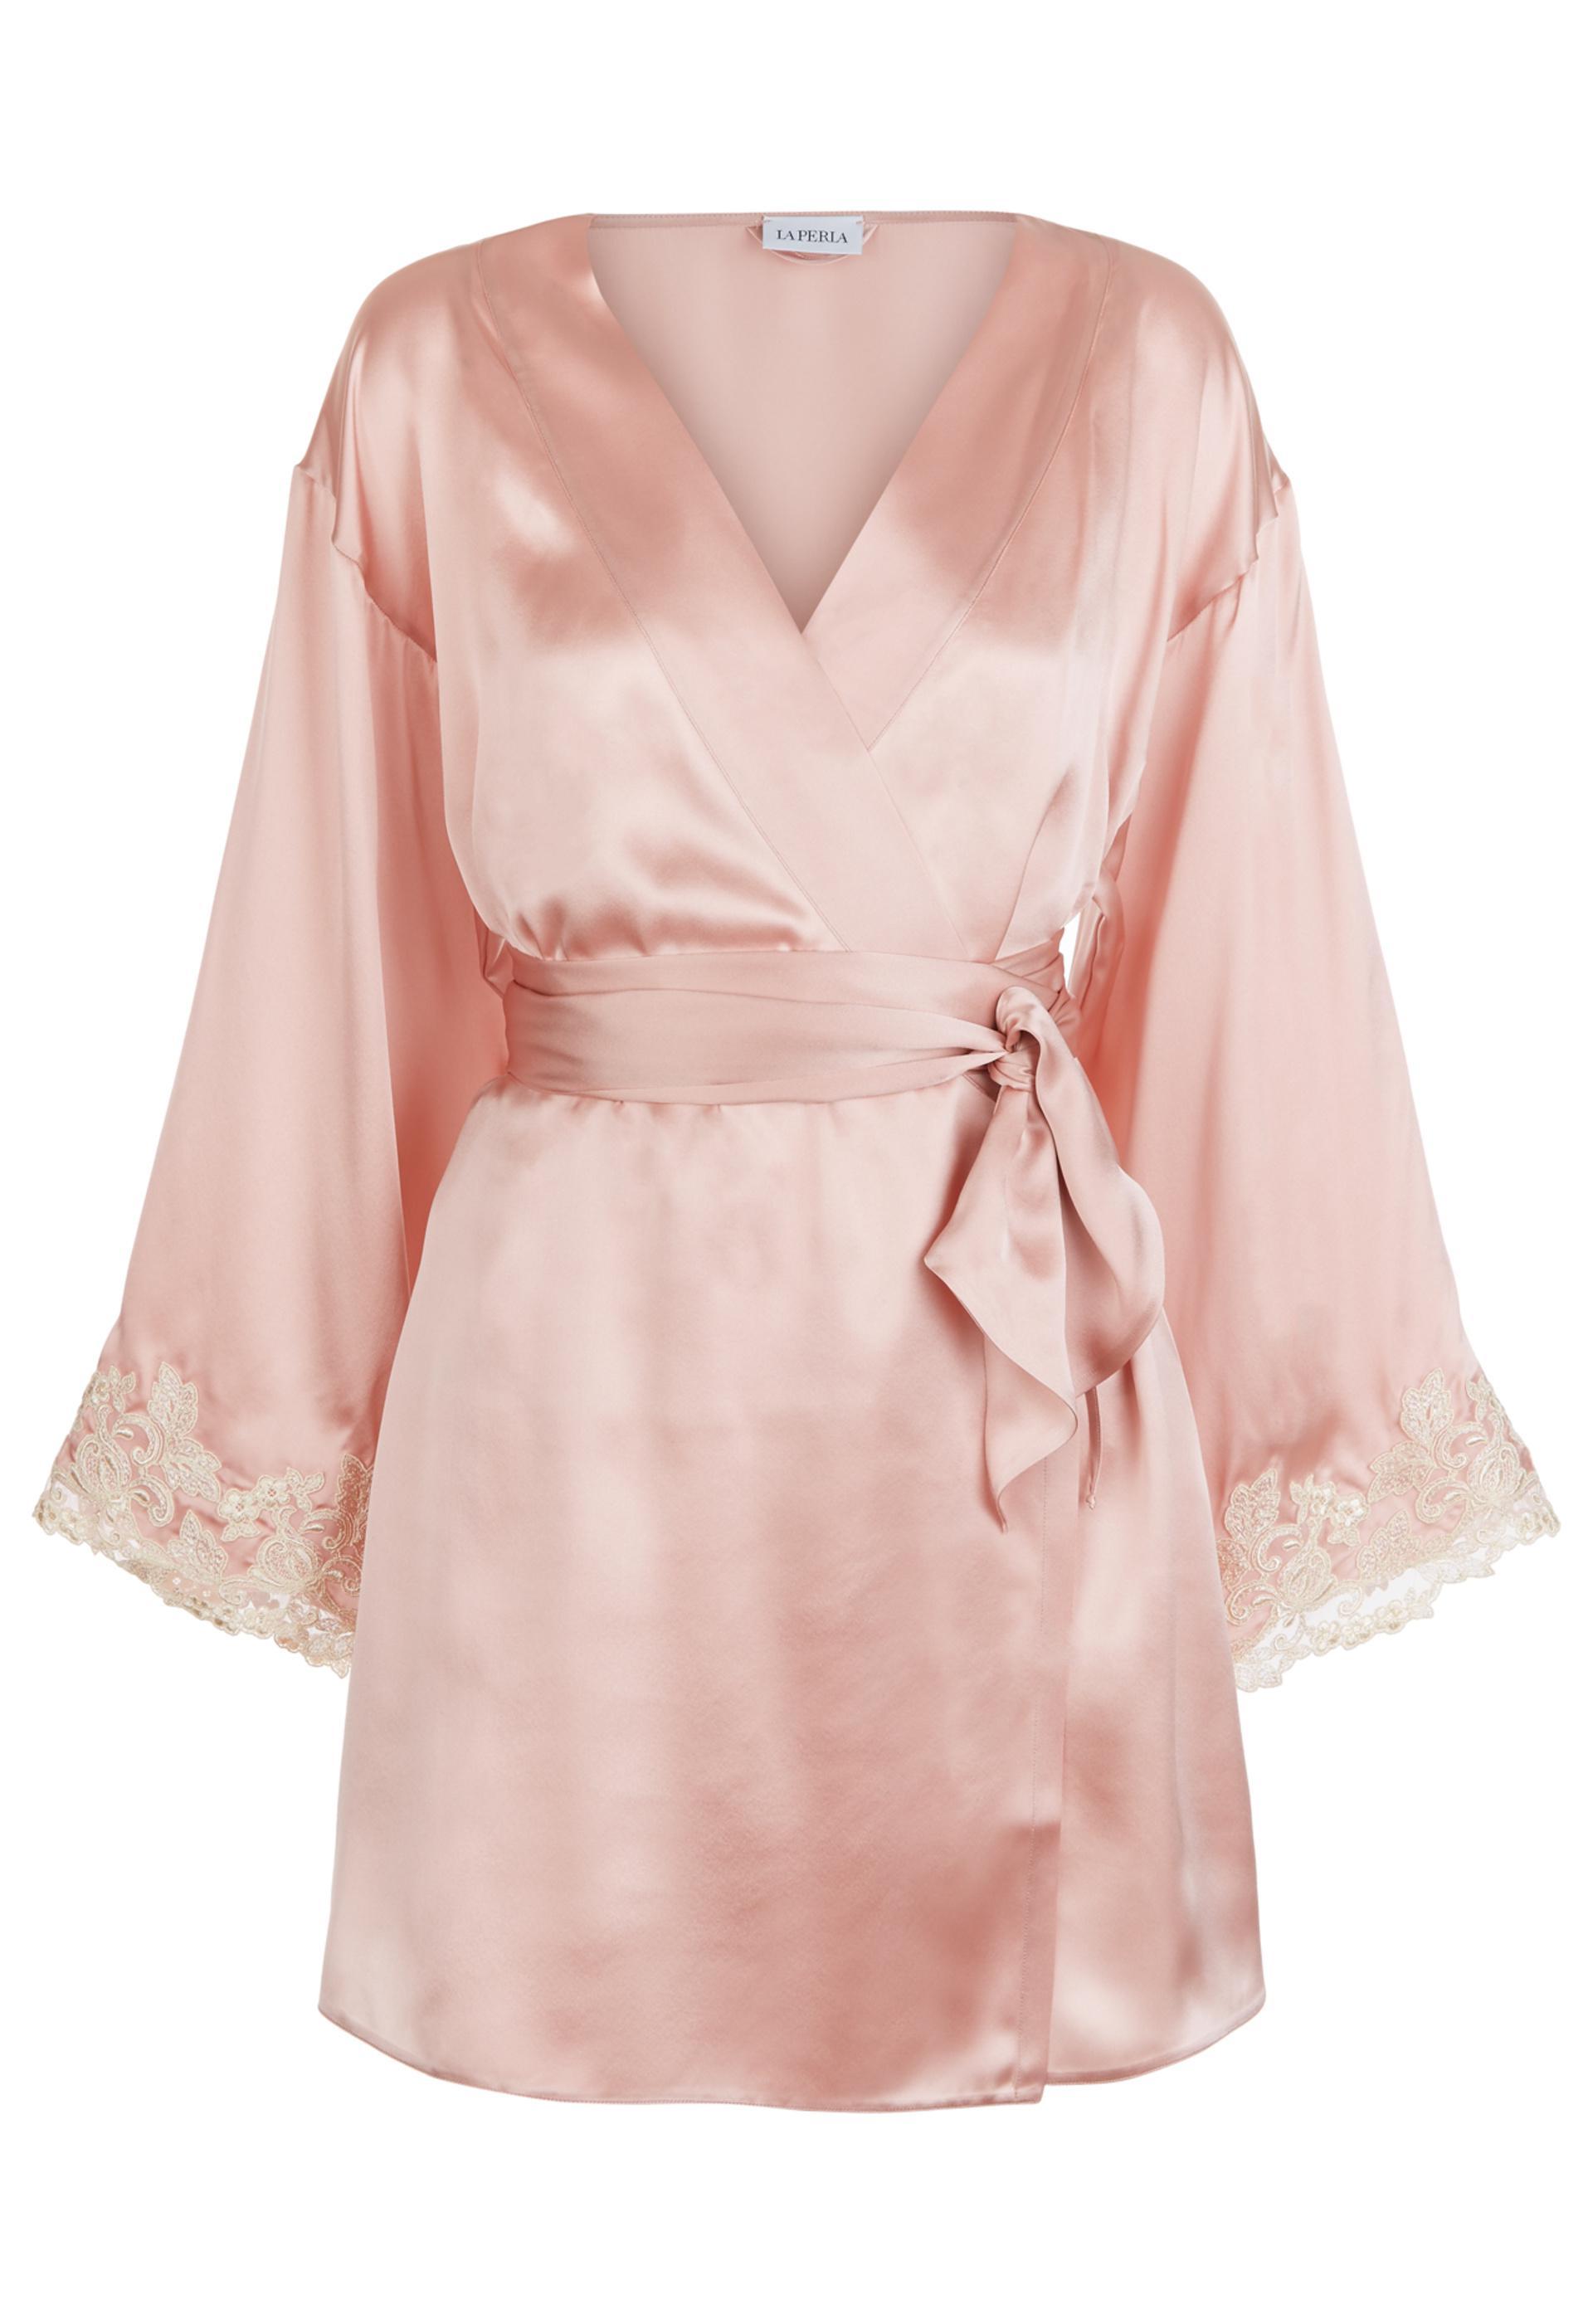 Lyst - La Perla Maison Powder Pink Silk Satin Short Robe With ... 63af5e980